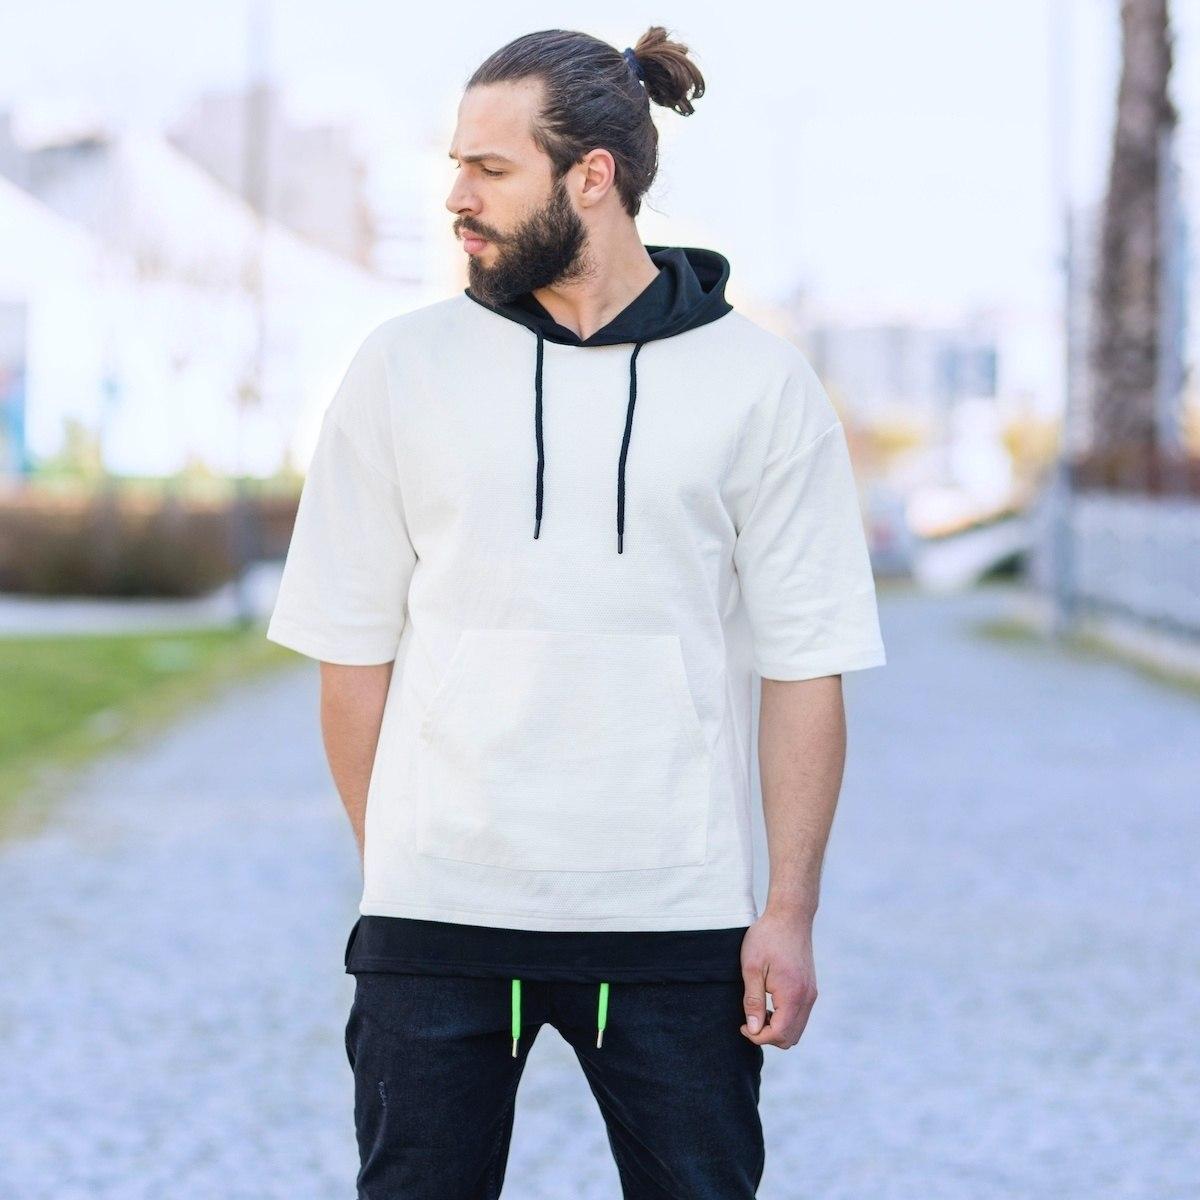 Men's Double-Colored Half-Sleeved Hoodie In Black-White